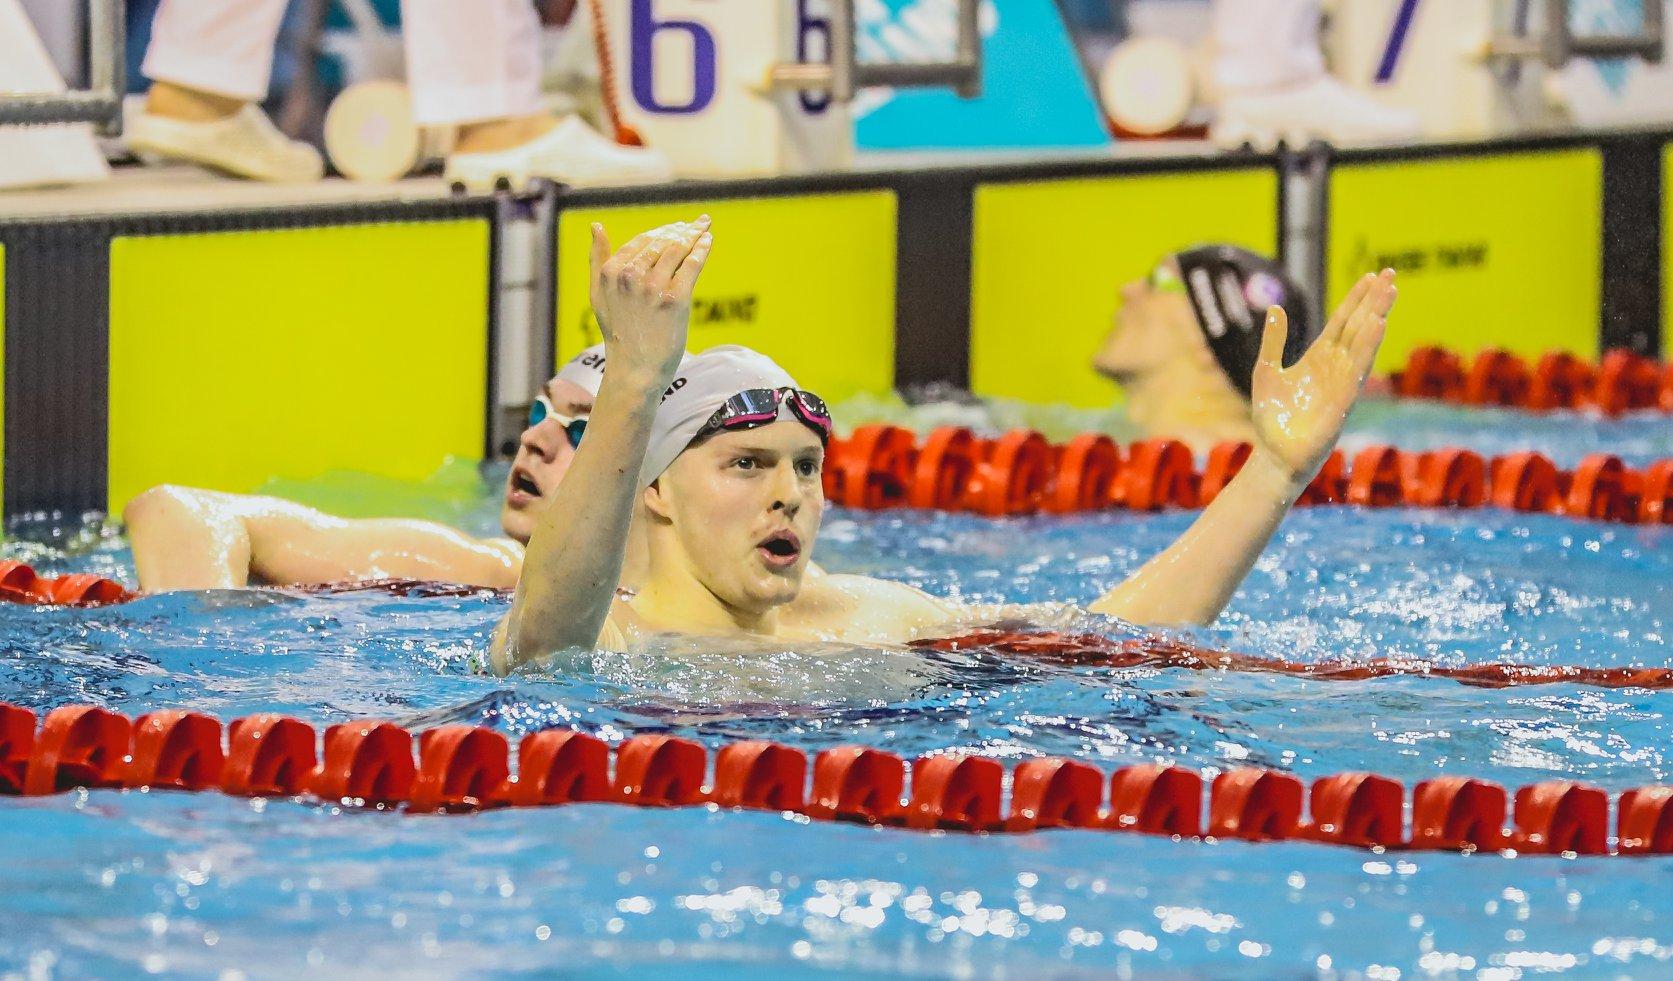 Swimming at the 2019 World Aquatics Championships – Women's 4 × 200 metre freestyle relay